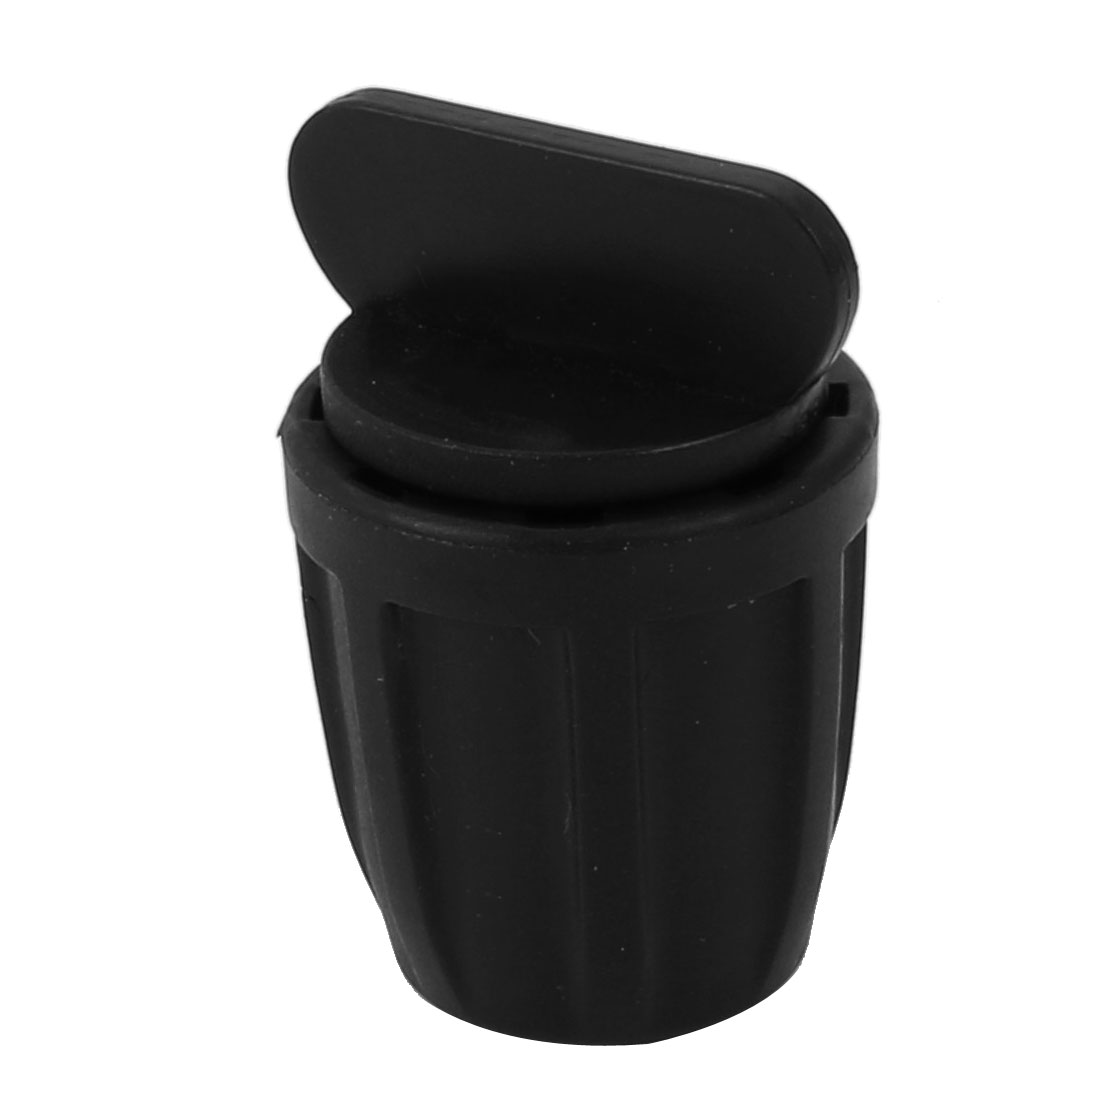 Garden Hose Nozzle Splitter 8/11 mm Single Way Barb Hose Connector Black